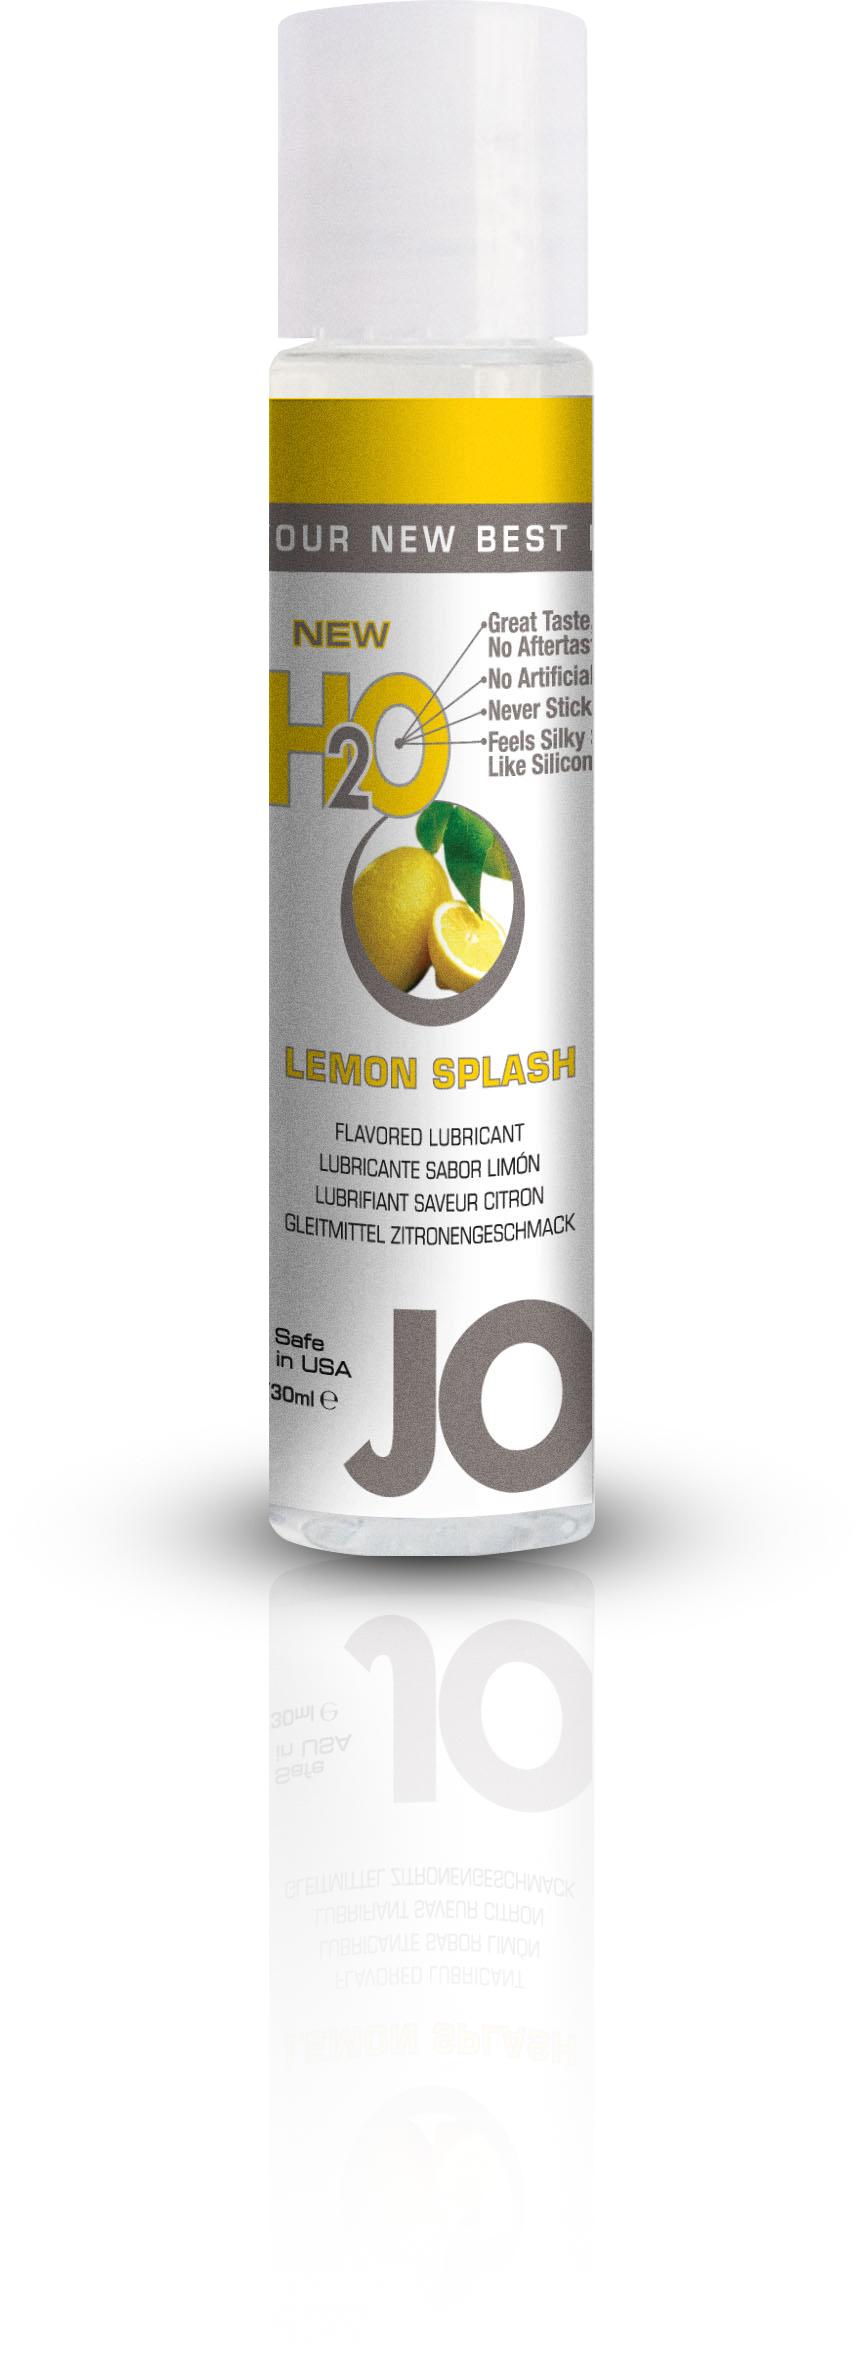 30120_JO_h2o_flavored_lubricant_1oz_1oz_lemon.jpg